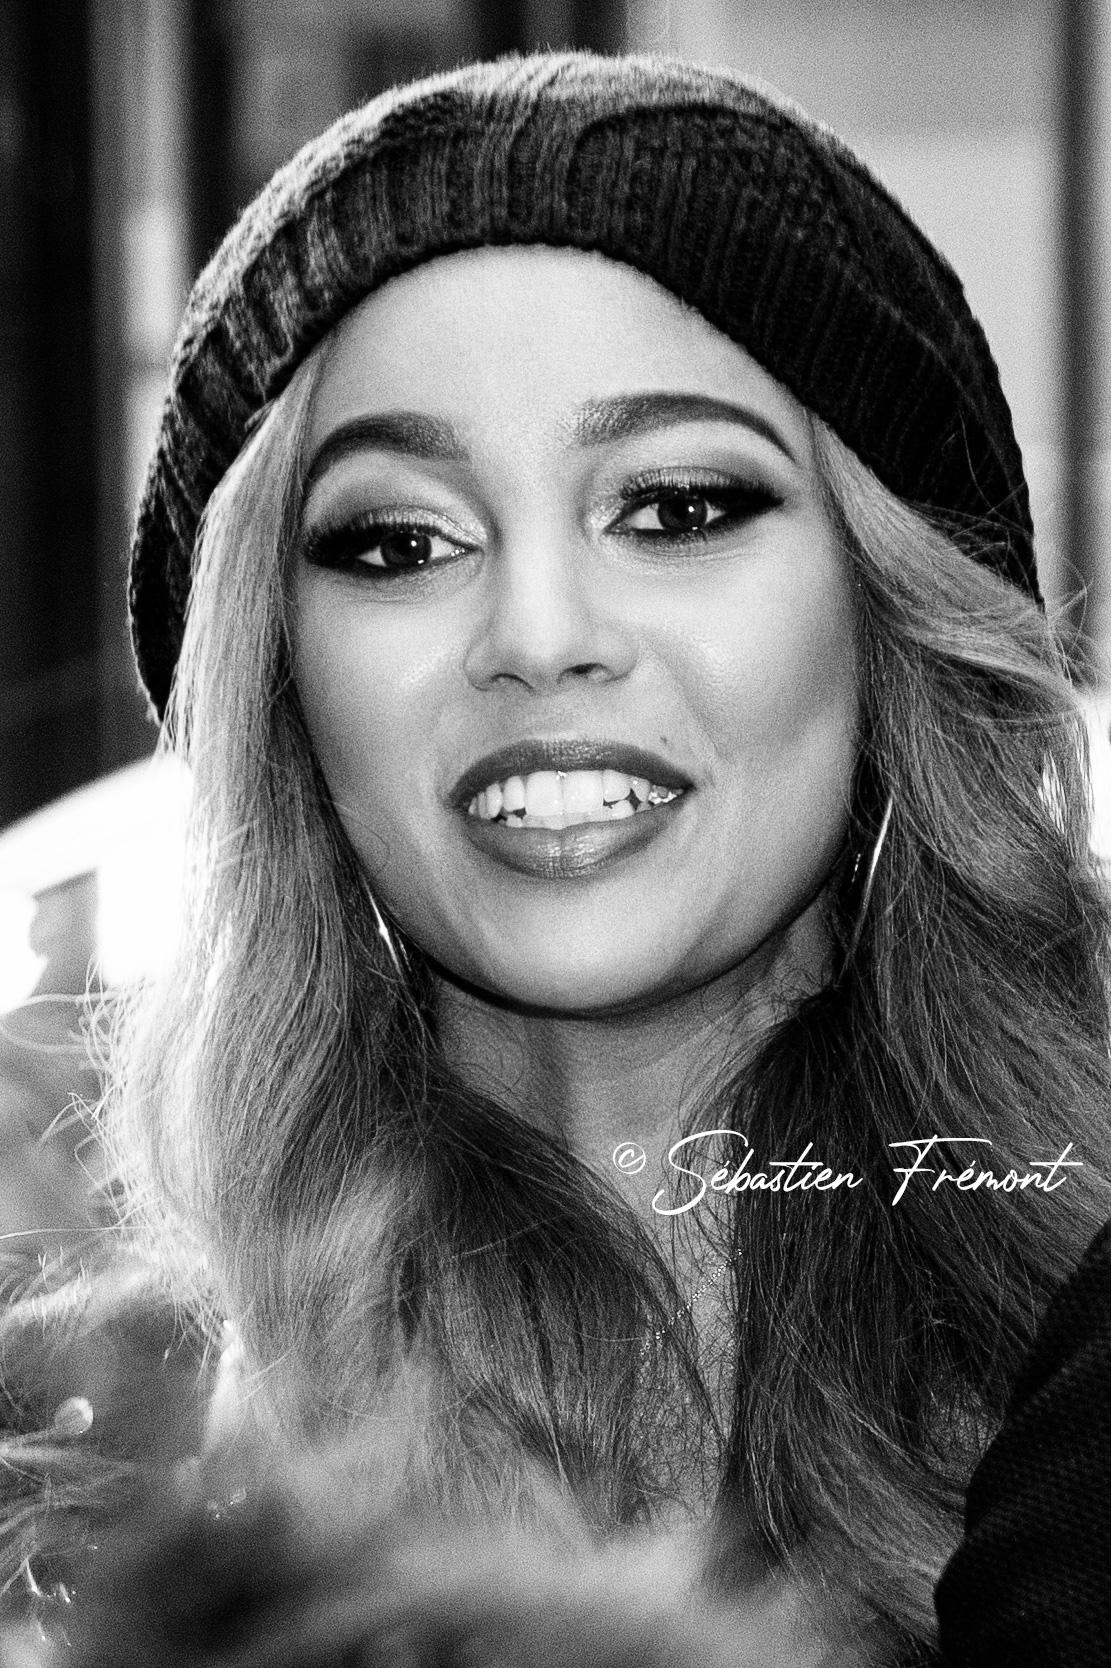 French Photographer Portrait Photography Vanessa Morgan / Riverdale